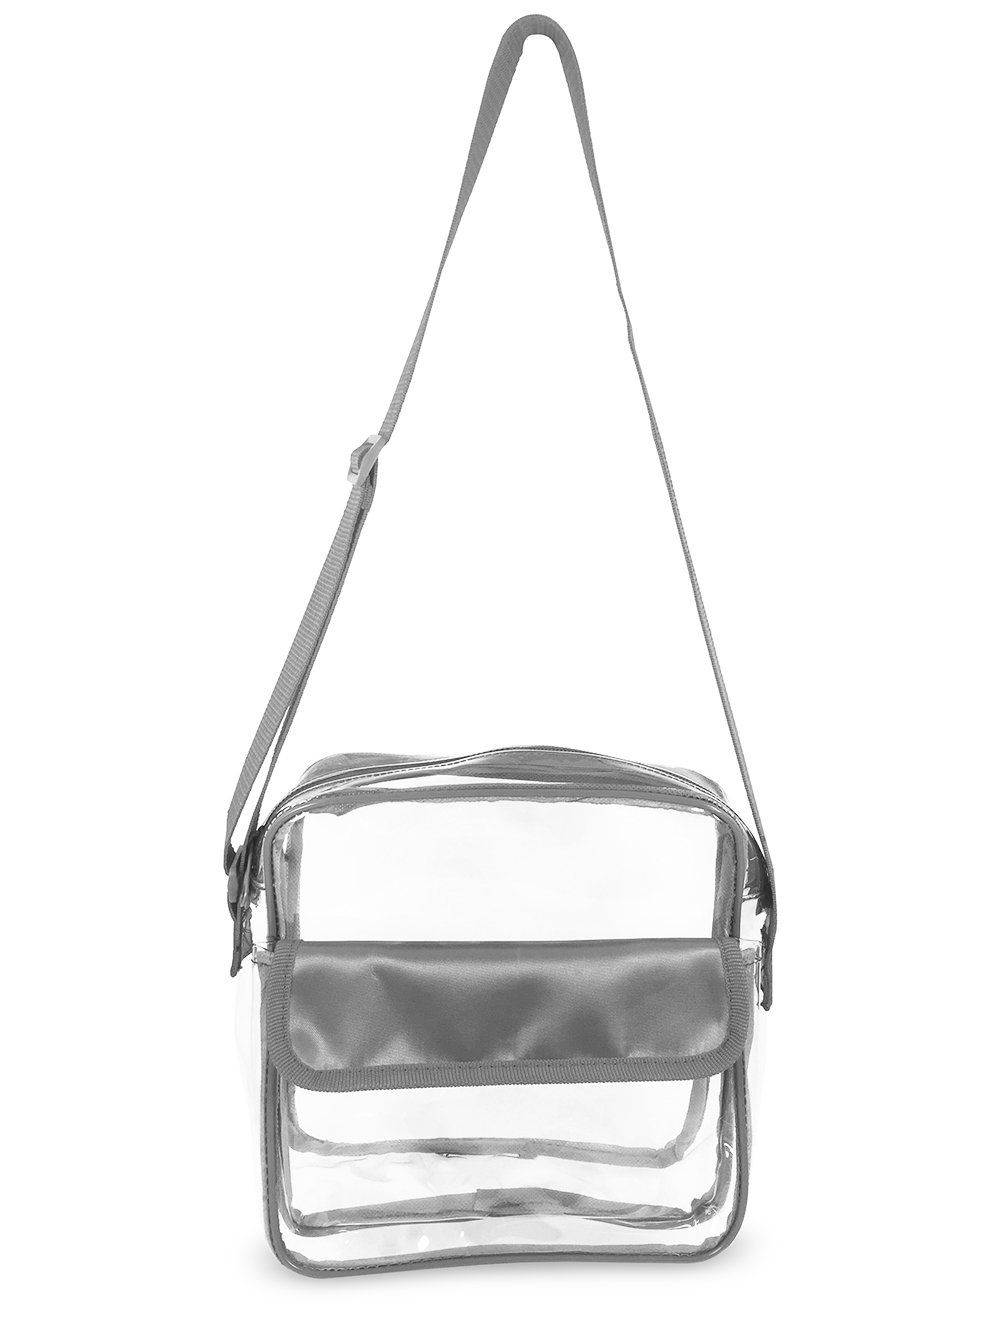 Event Stadium Approved Clear Messenger Bag Clear Shoulder Bag Transparent Purse with Adjustable Strap (Gray)